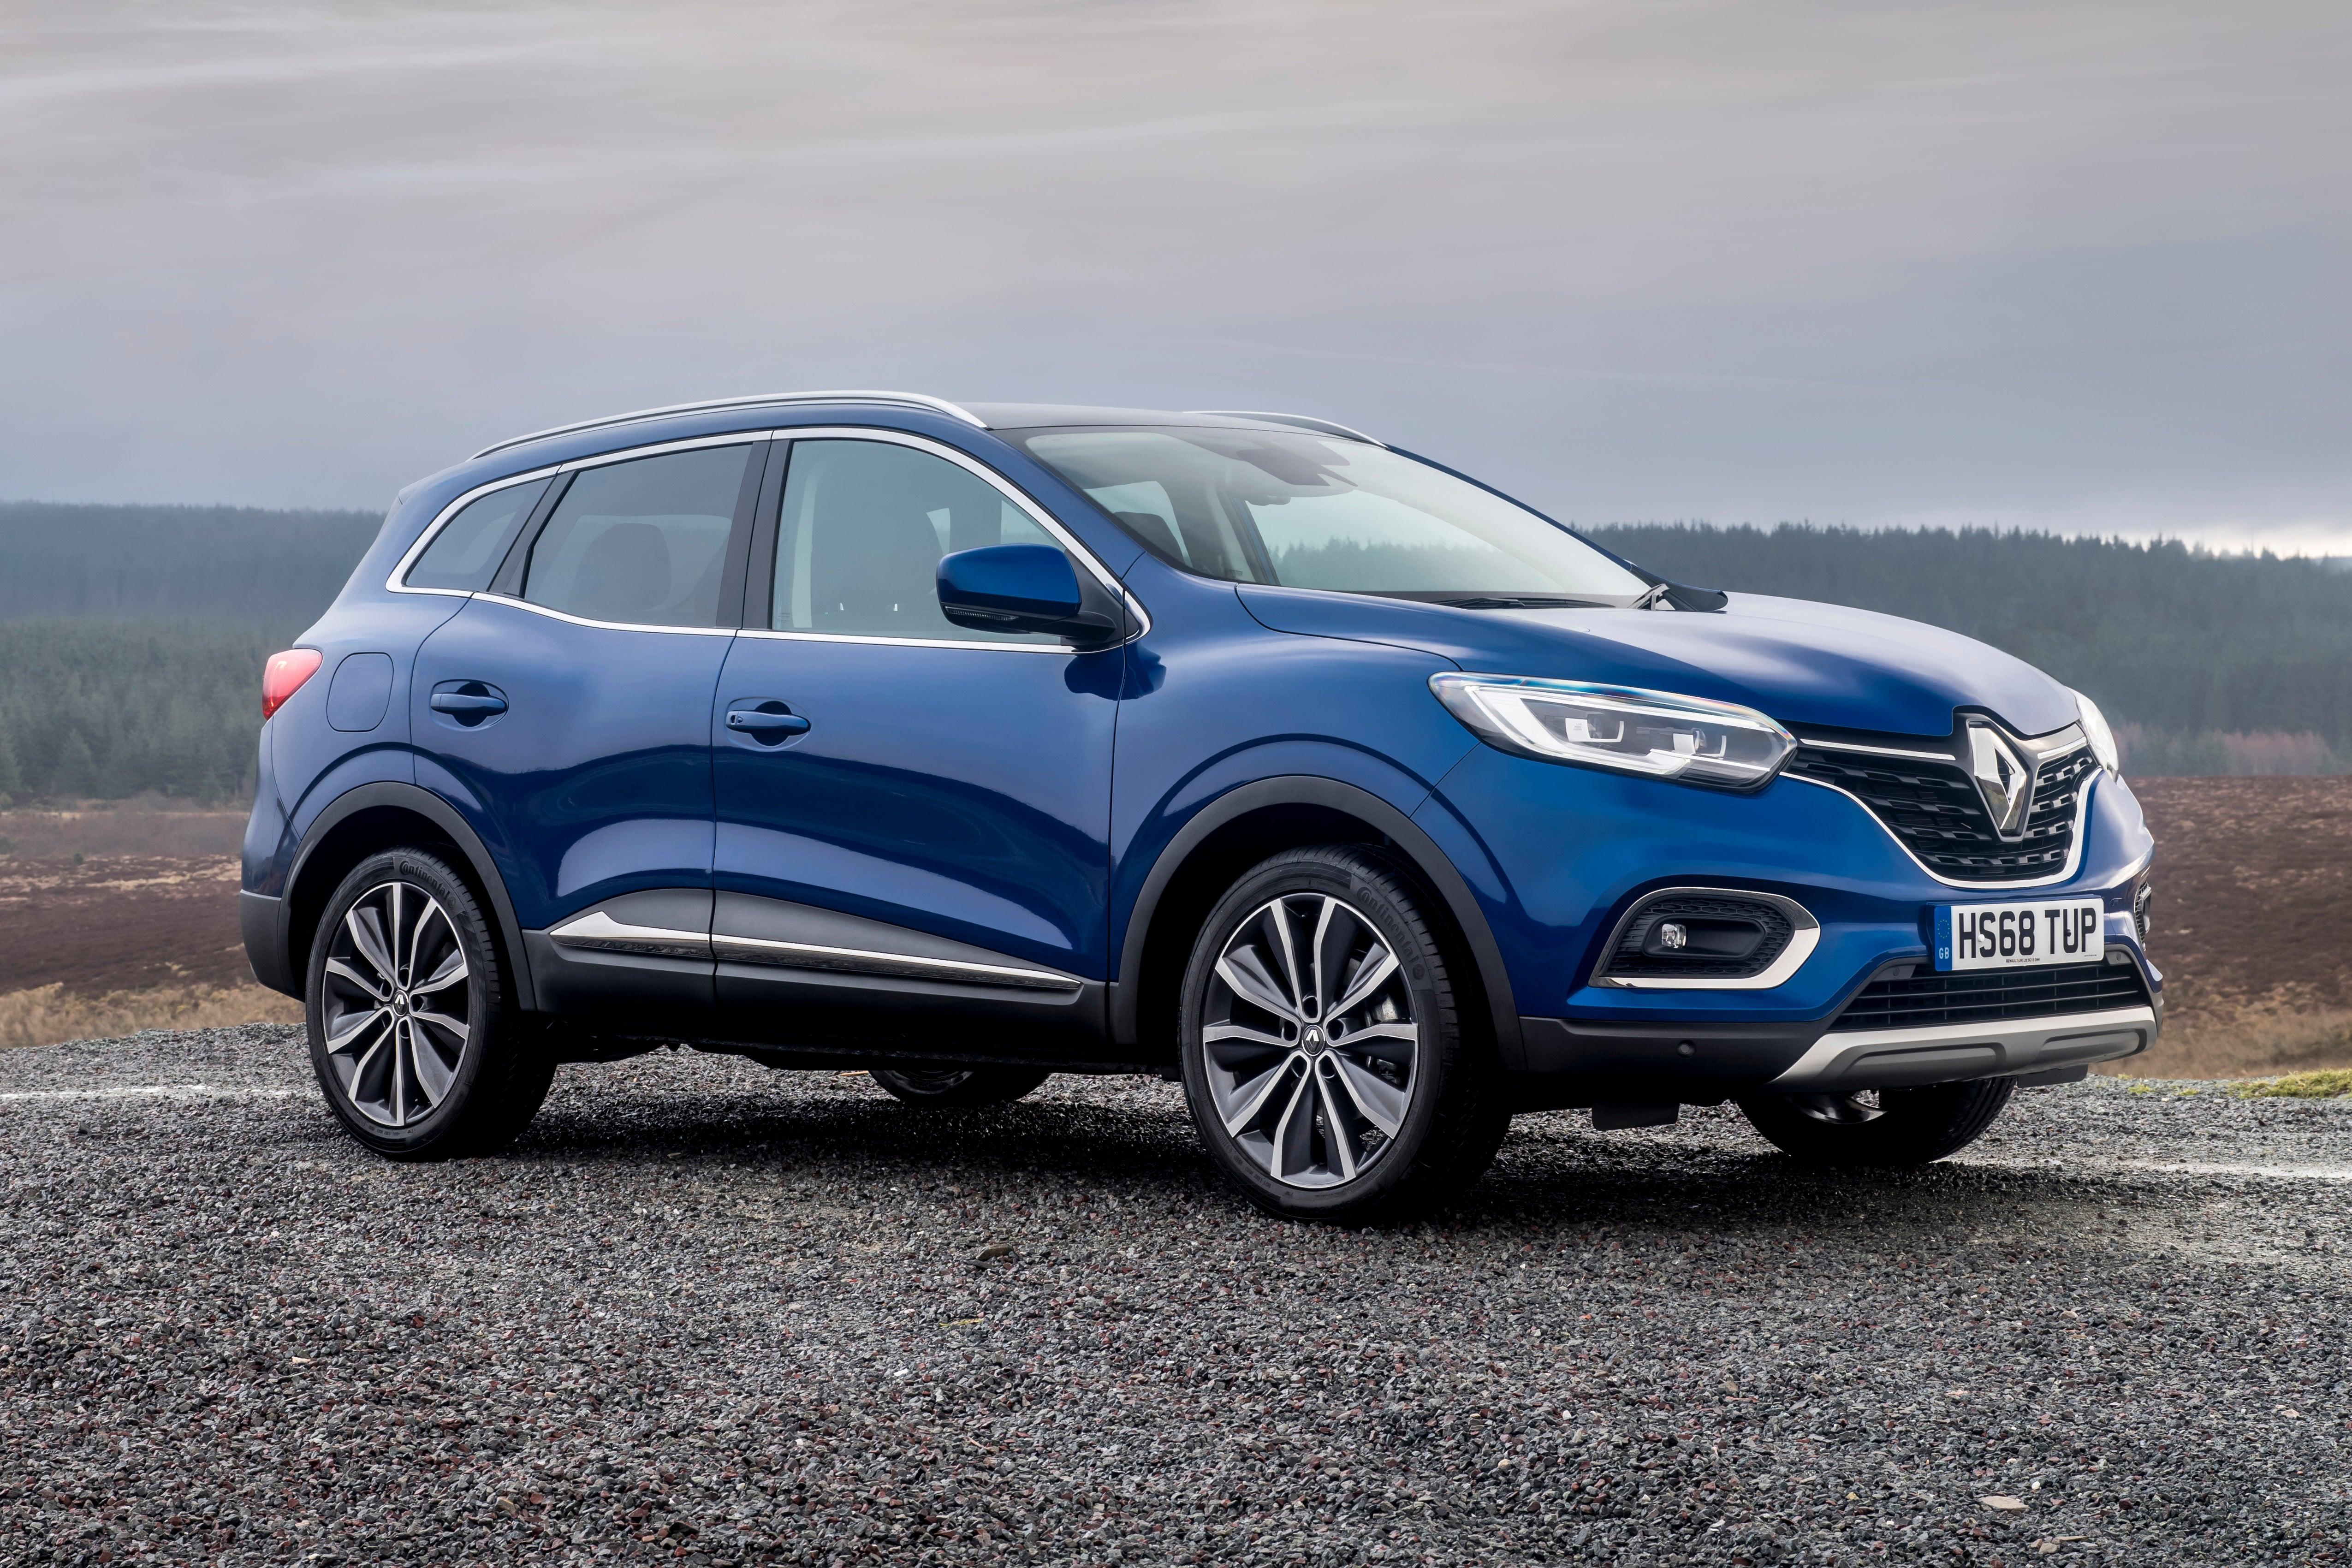 Renault Kadjar Review 2021 Side View